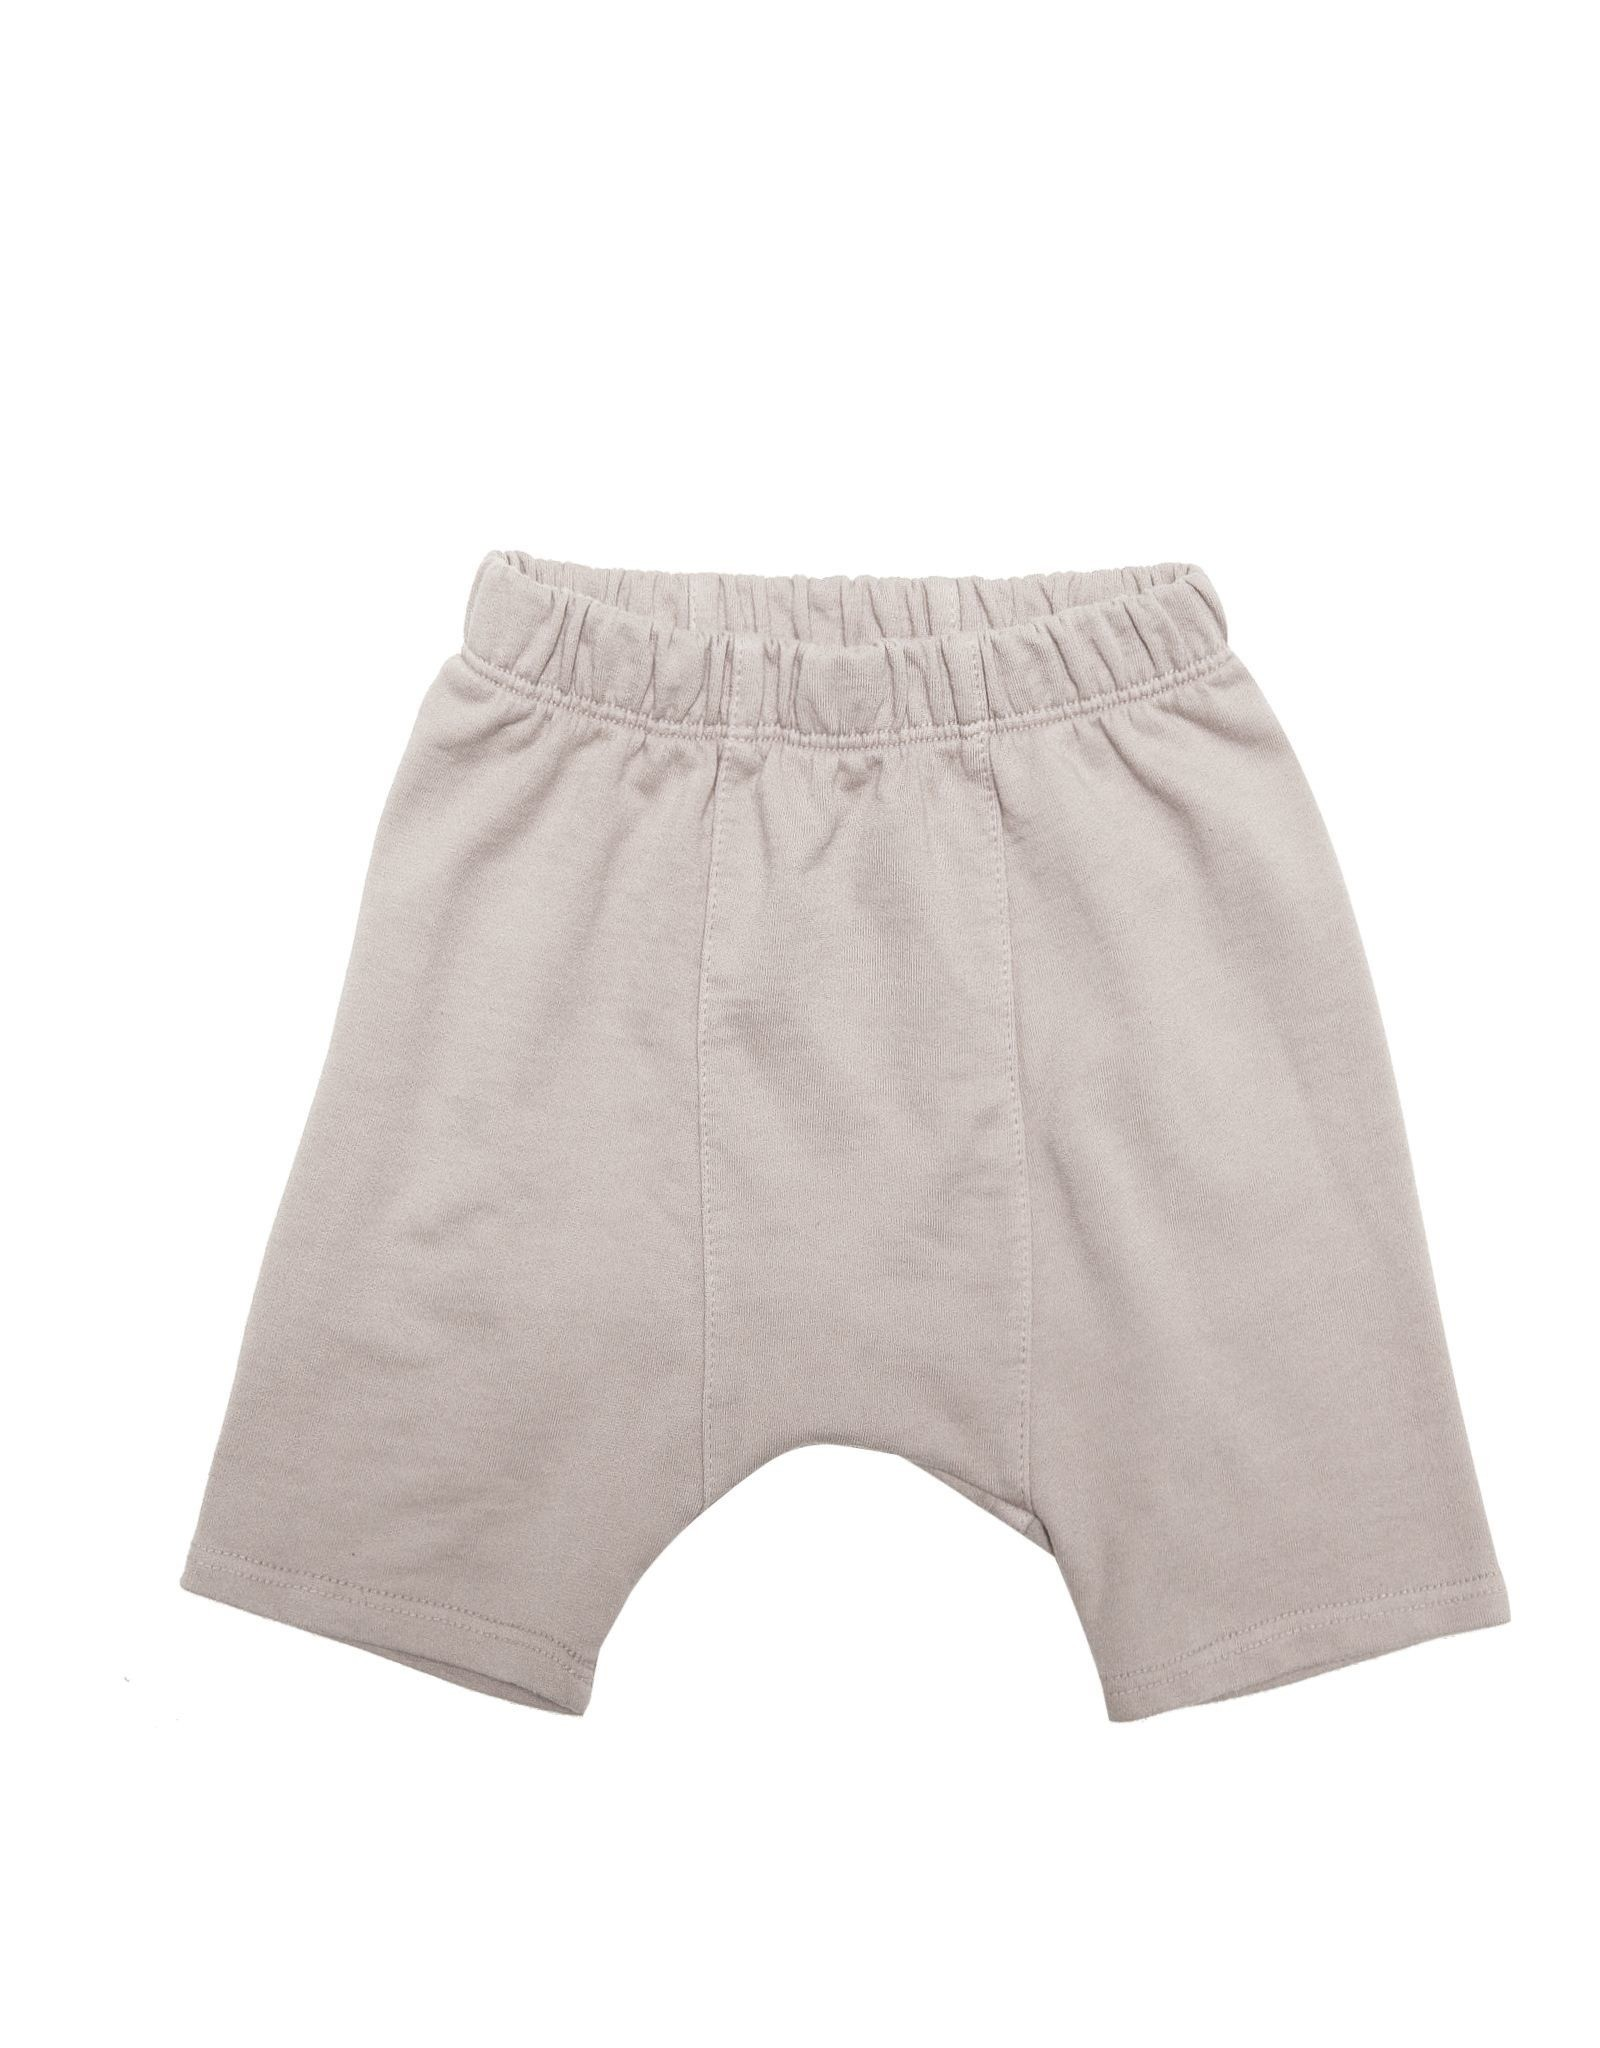 Go Gently Nation panel shorts- sandstone